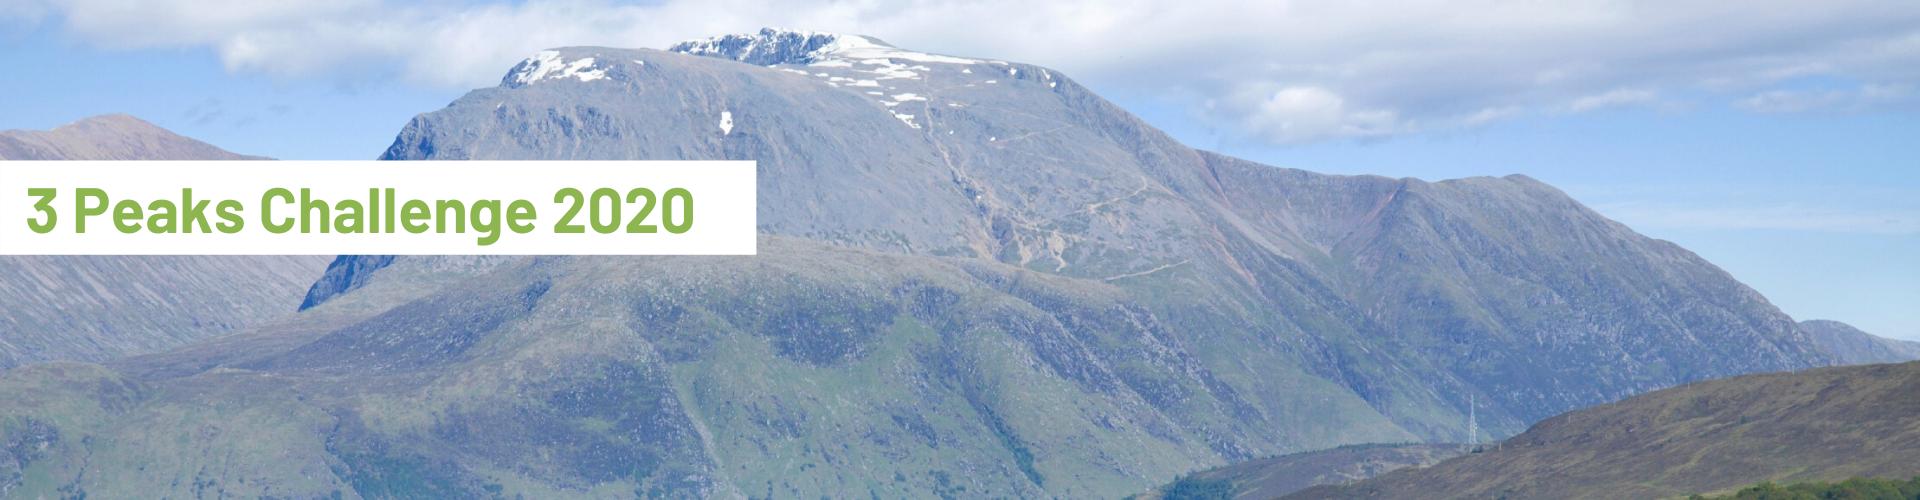 3 peaks challenge header (1)